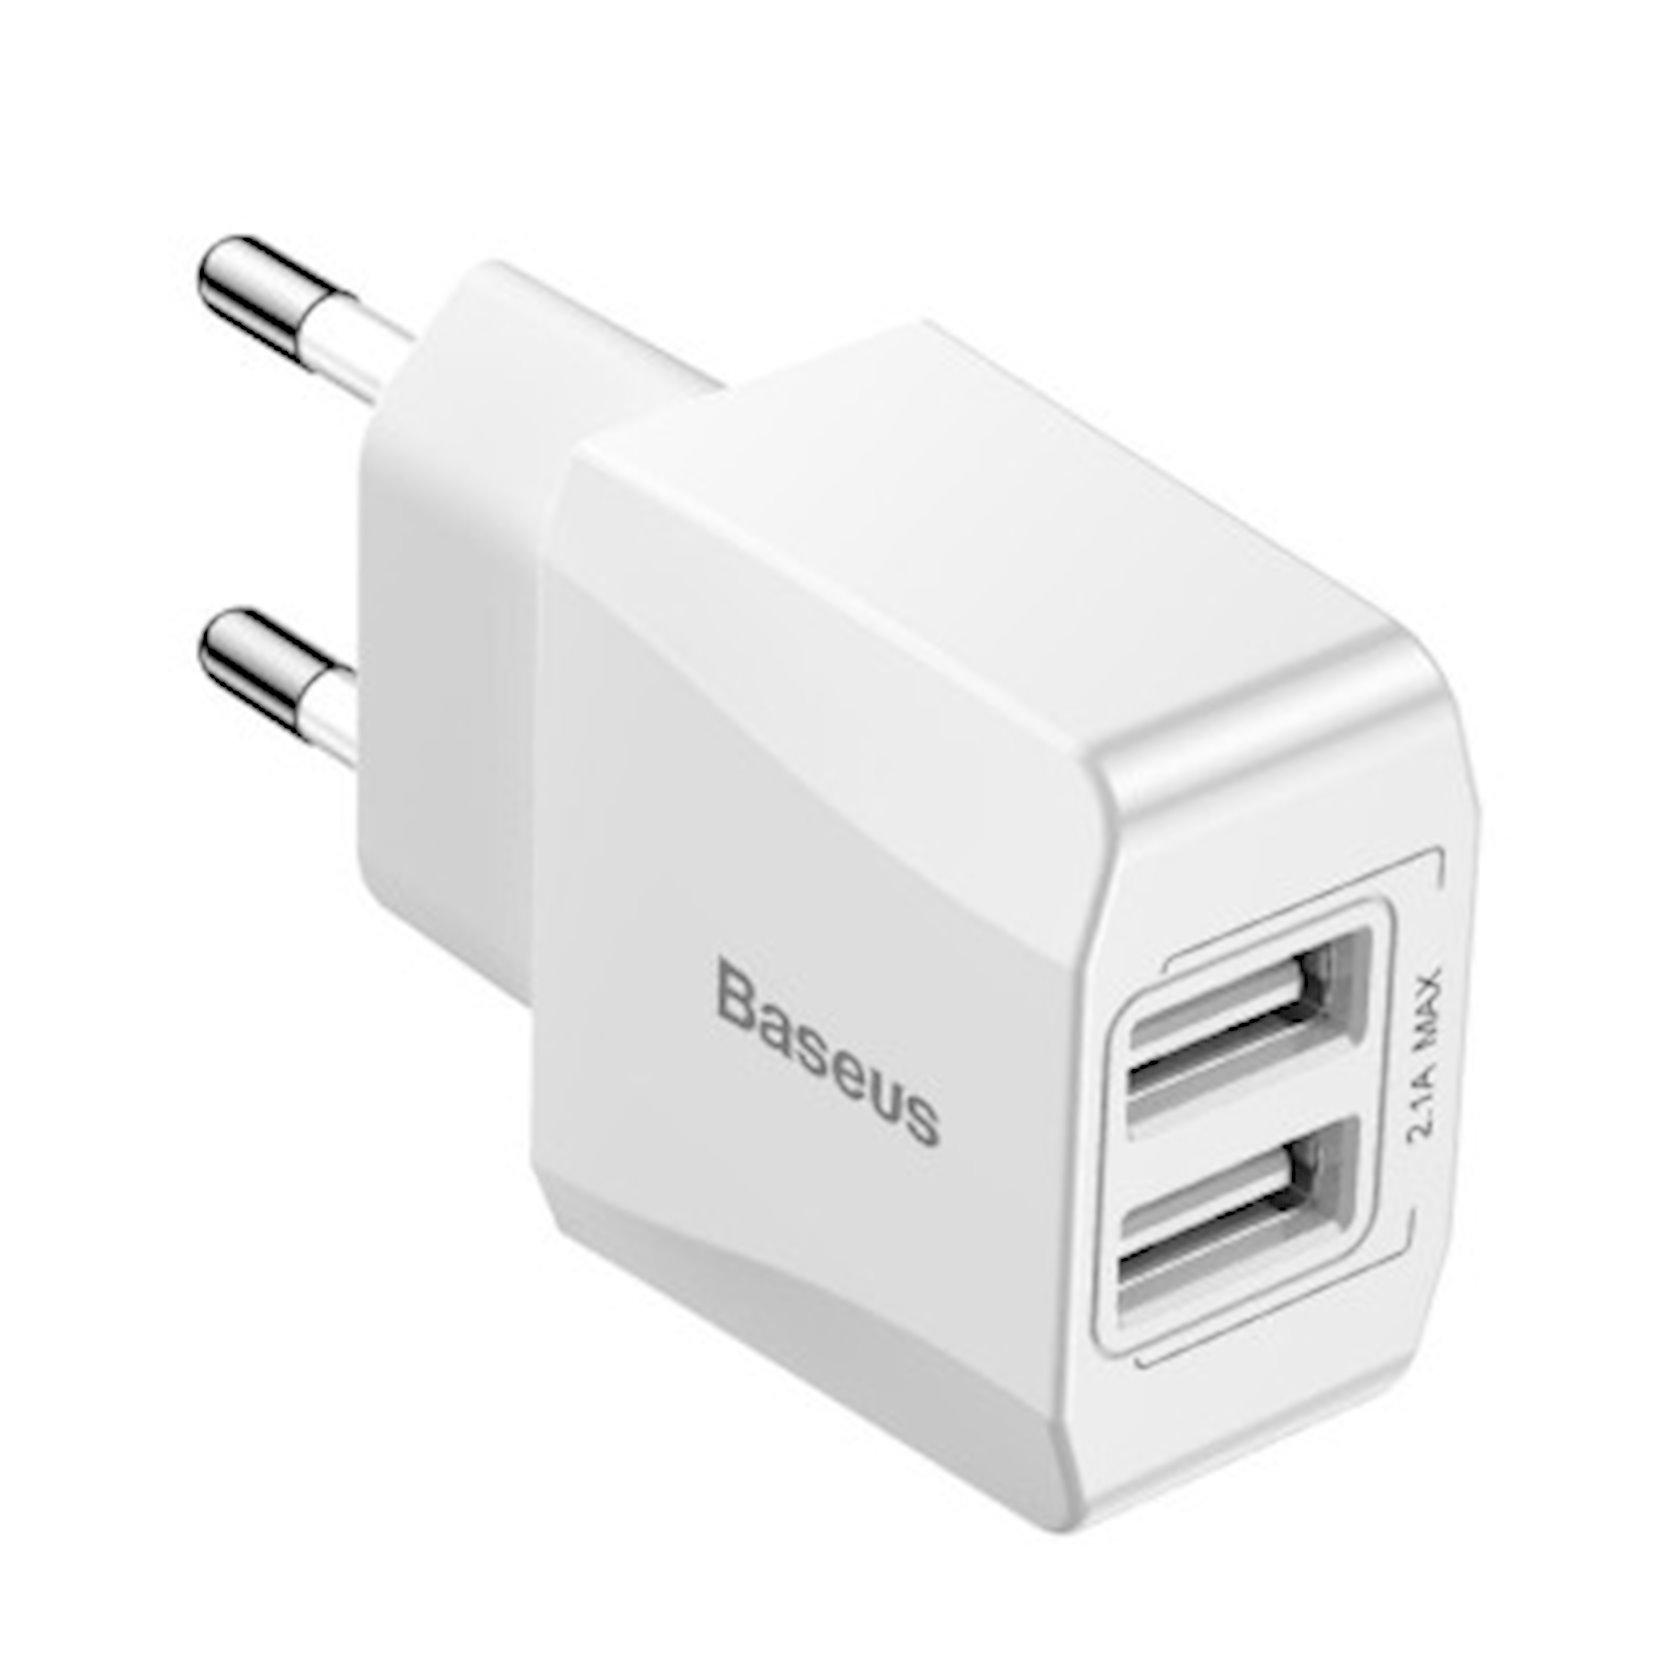 Enerji toplama cihazı Baseus CCALL-MN02, ağ